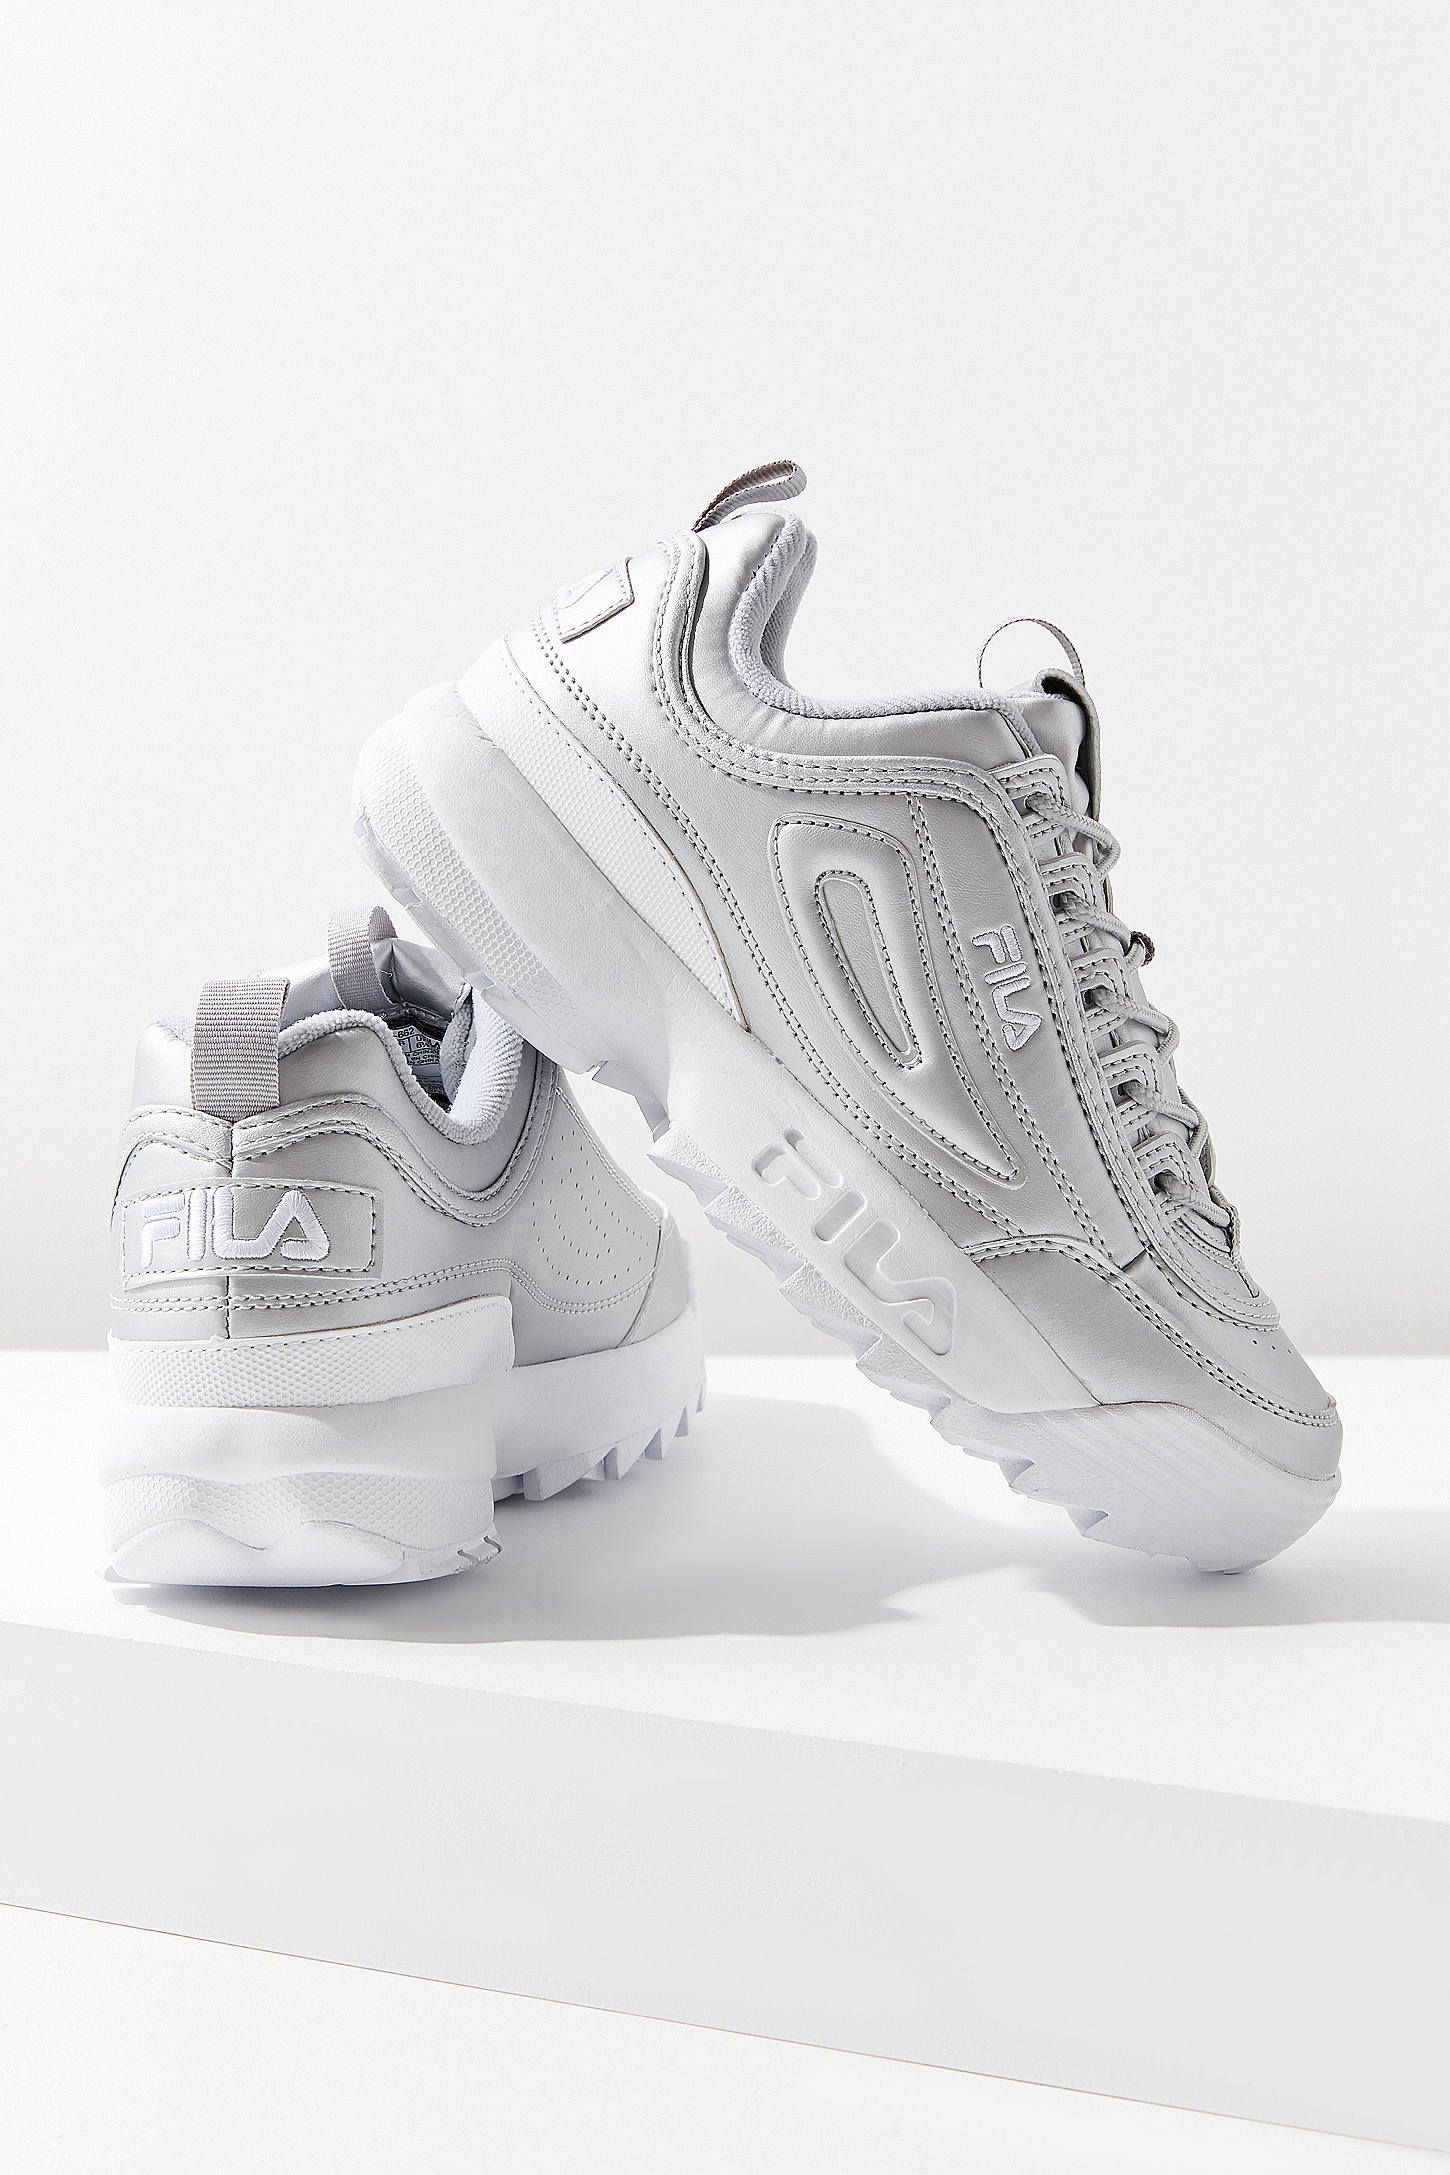 2d70050c1deb FILA Disruptor II Metallic Sneaker